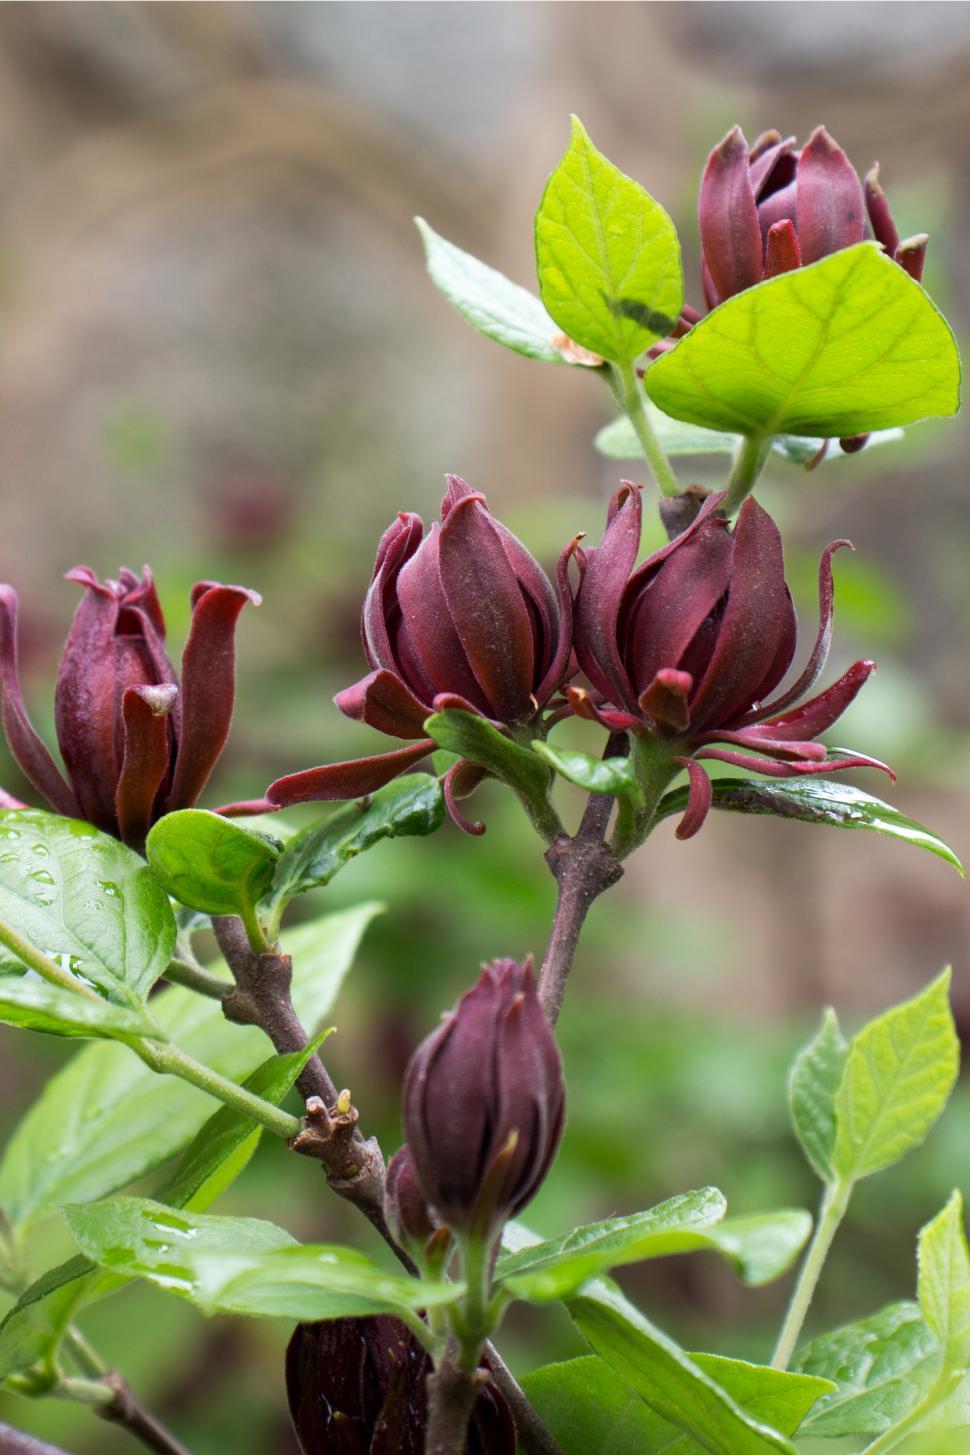 Download Free Stock Photo of Carolina Allspice Blooms